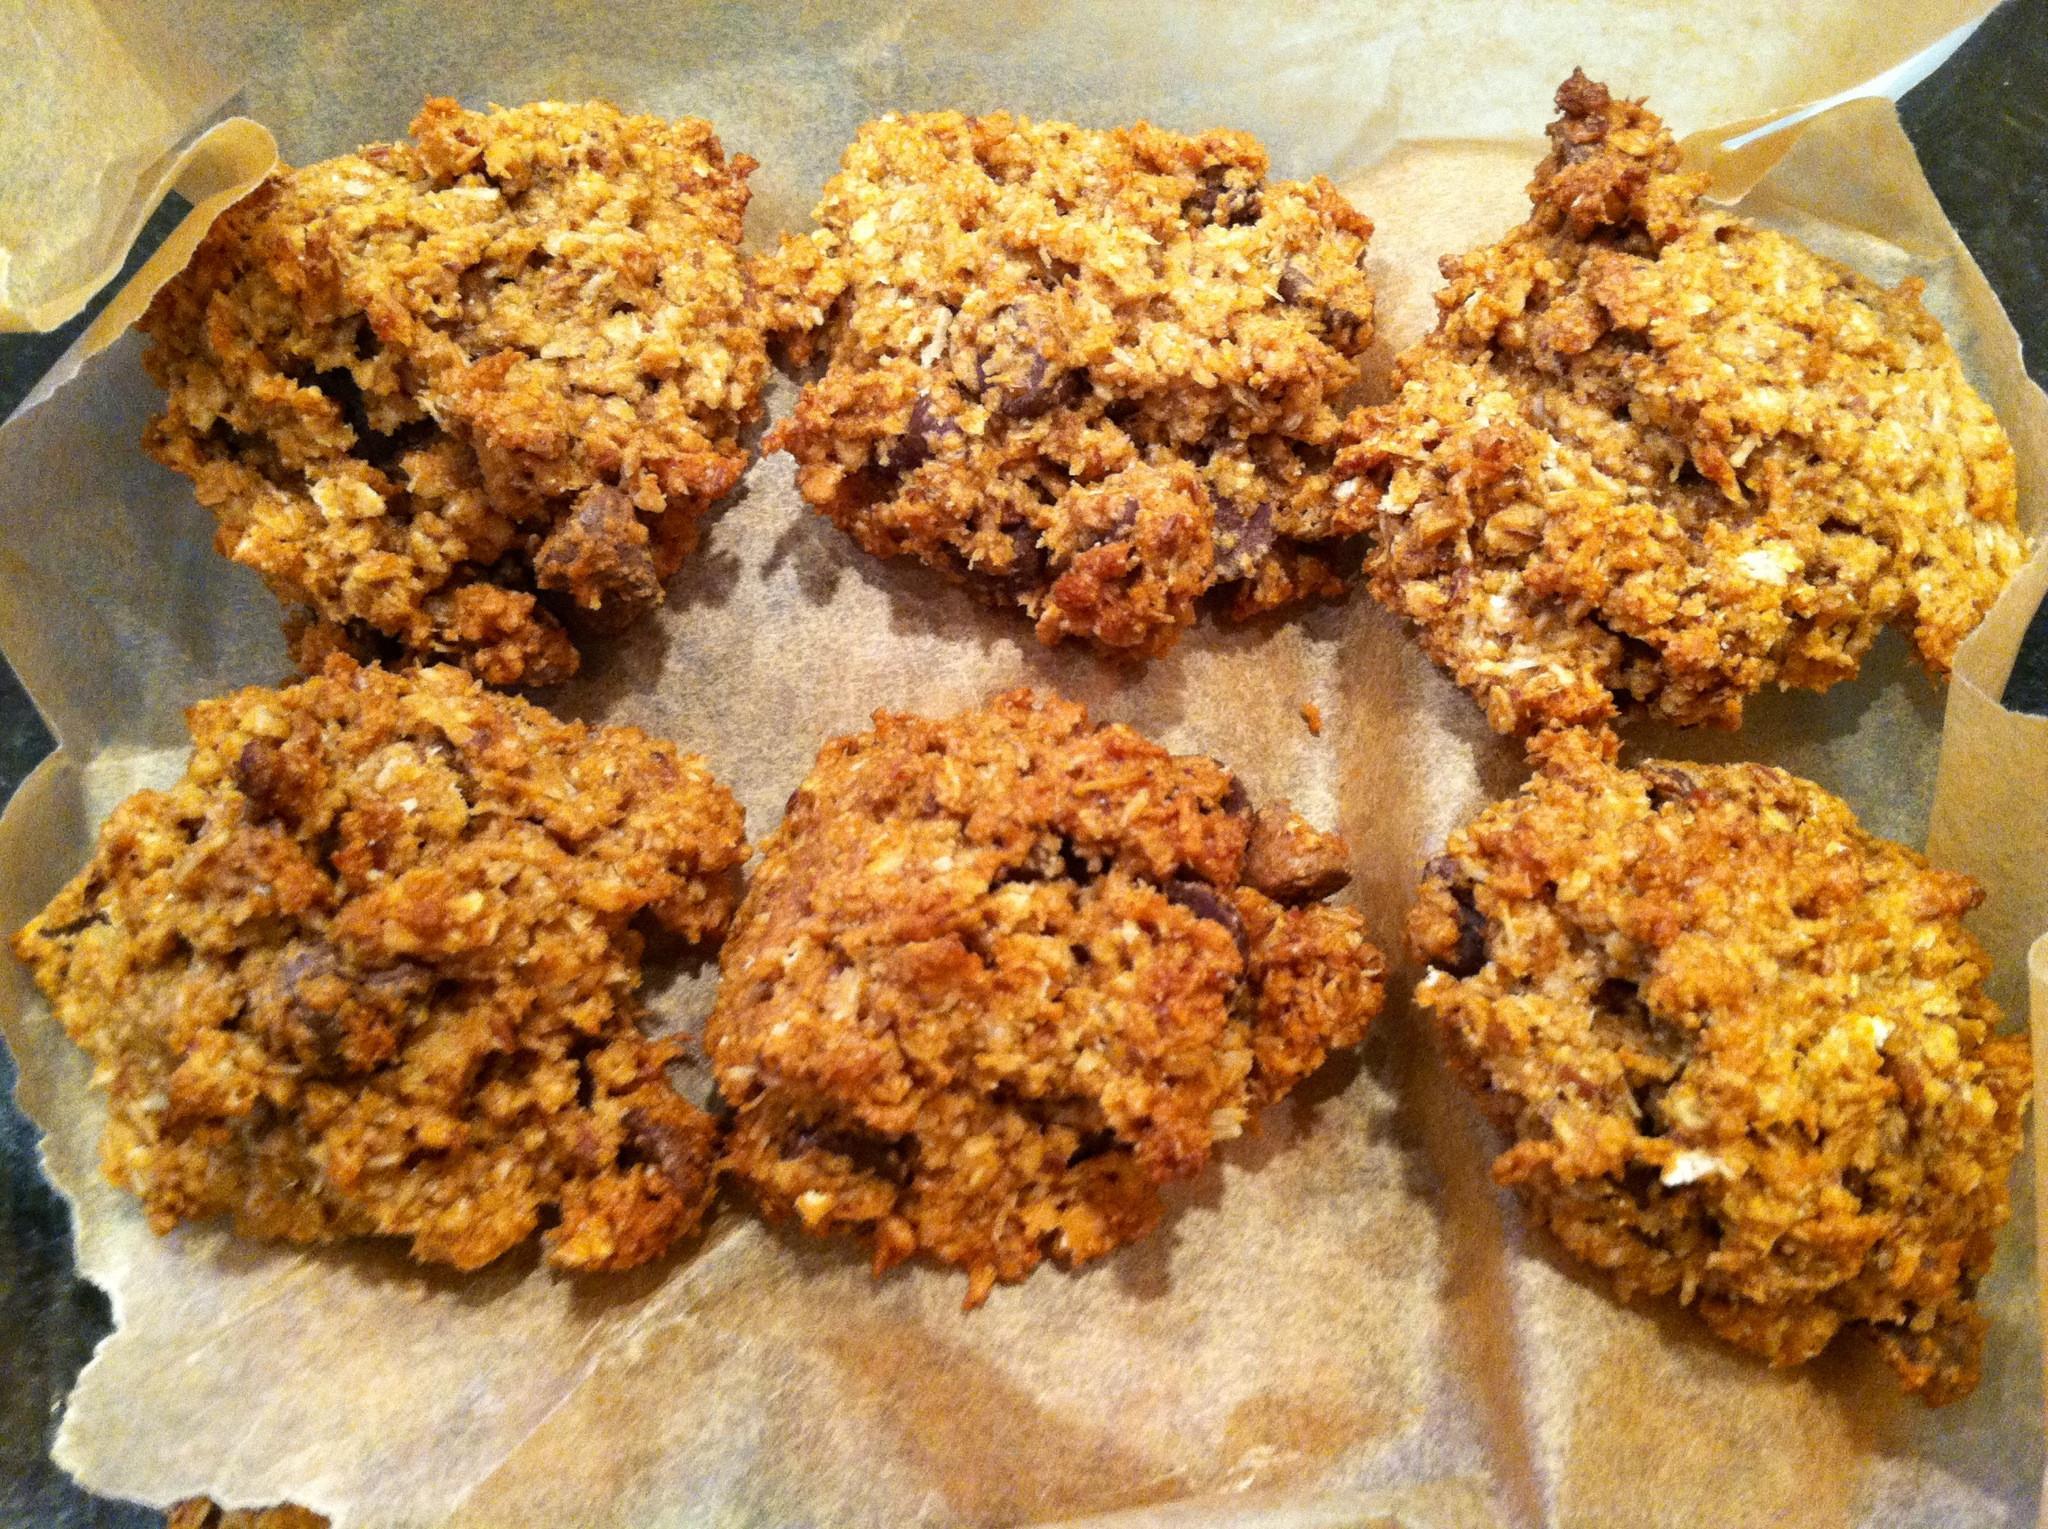 Vegan Coconut Cookies Recipes  Vegan Coconut Chocolate Chip Cookies